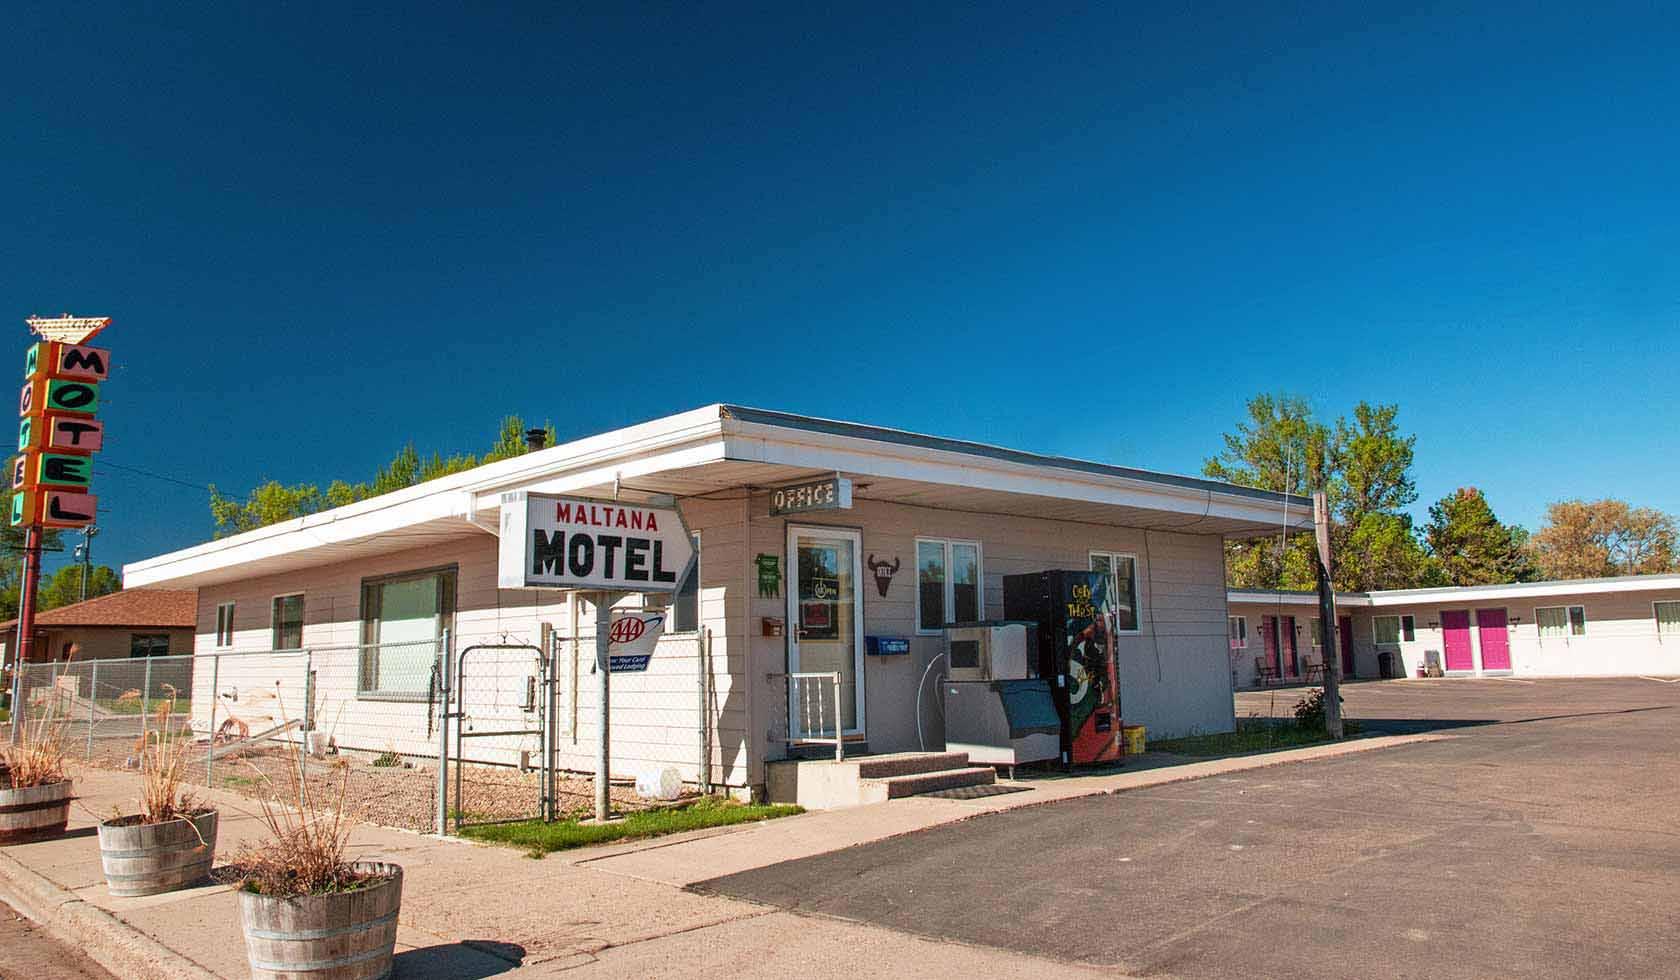 Maltana Motel | Missouri River Country